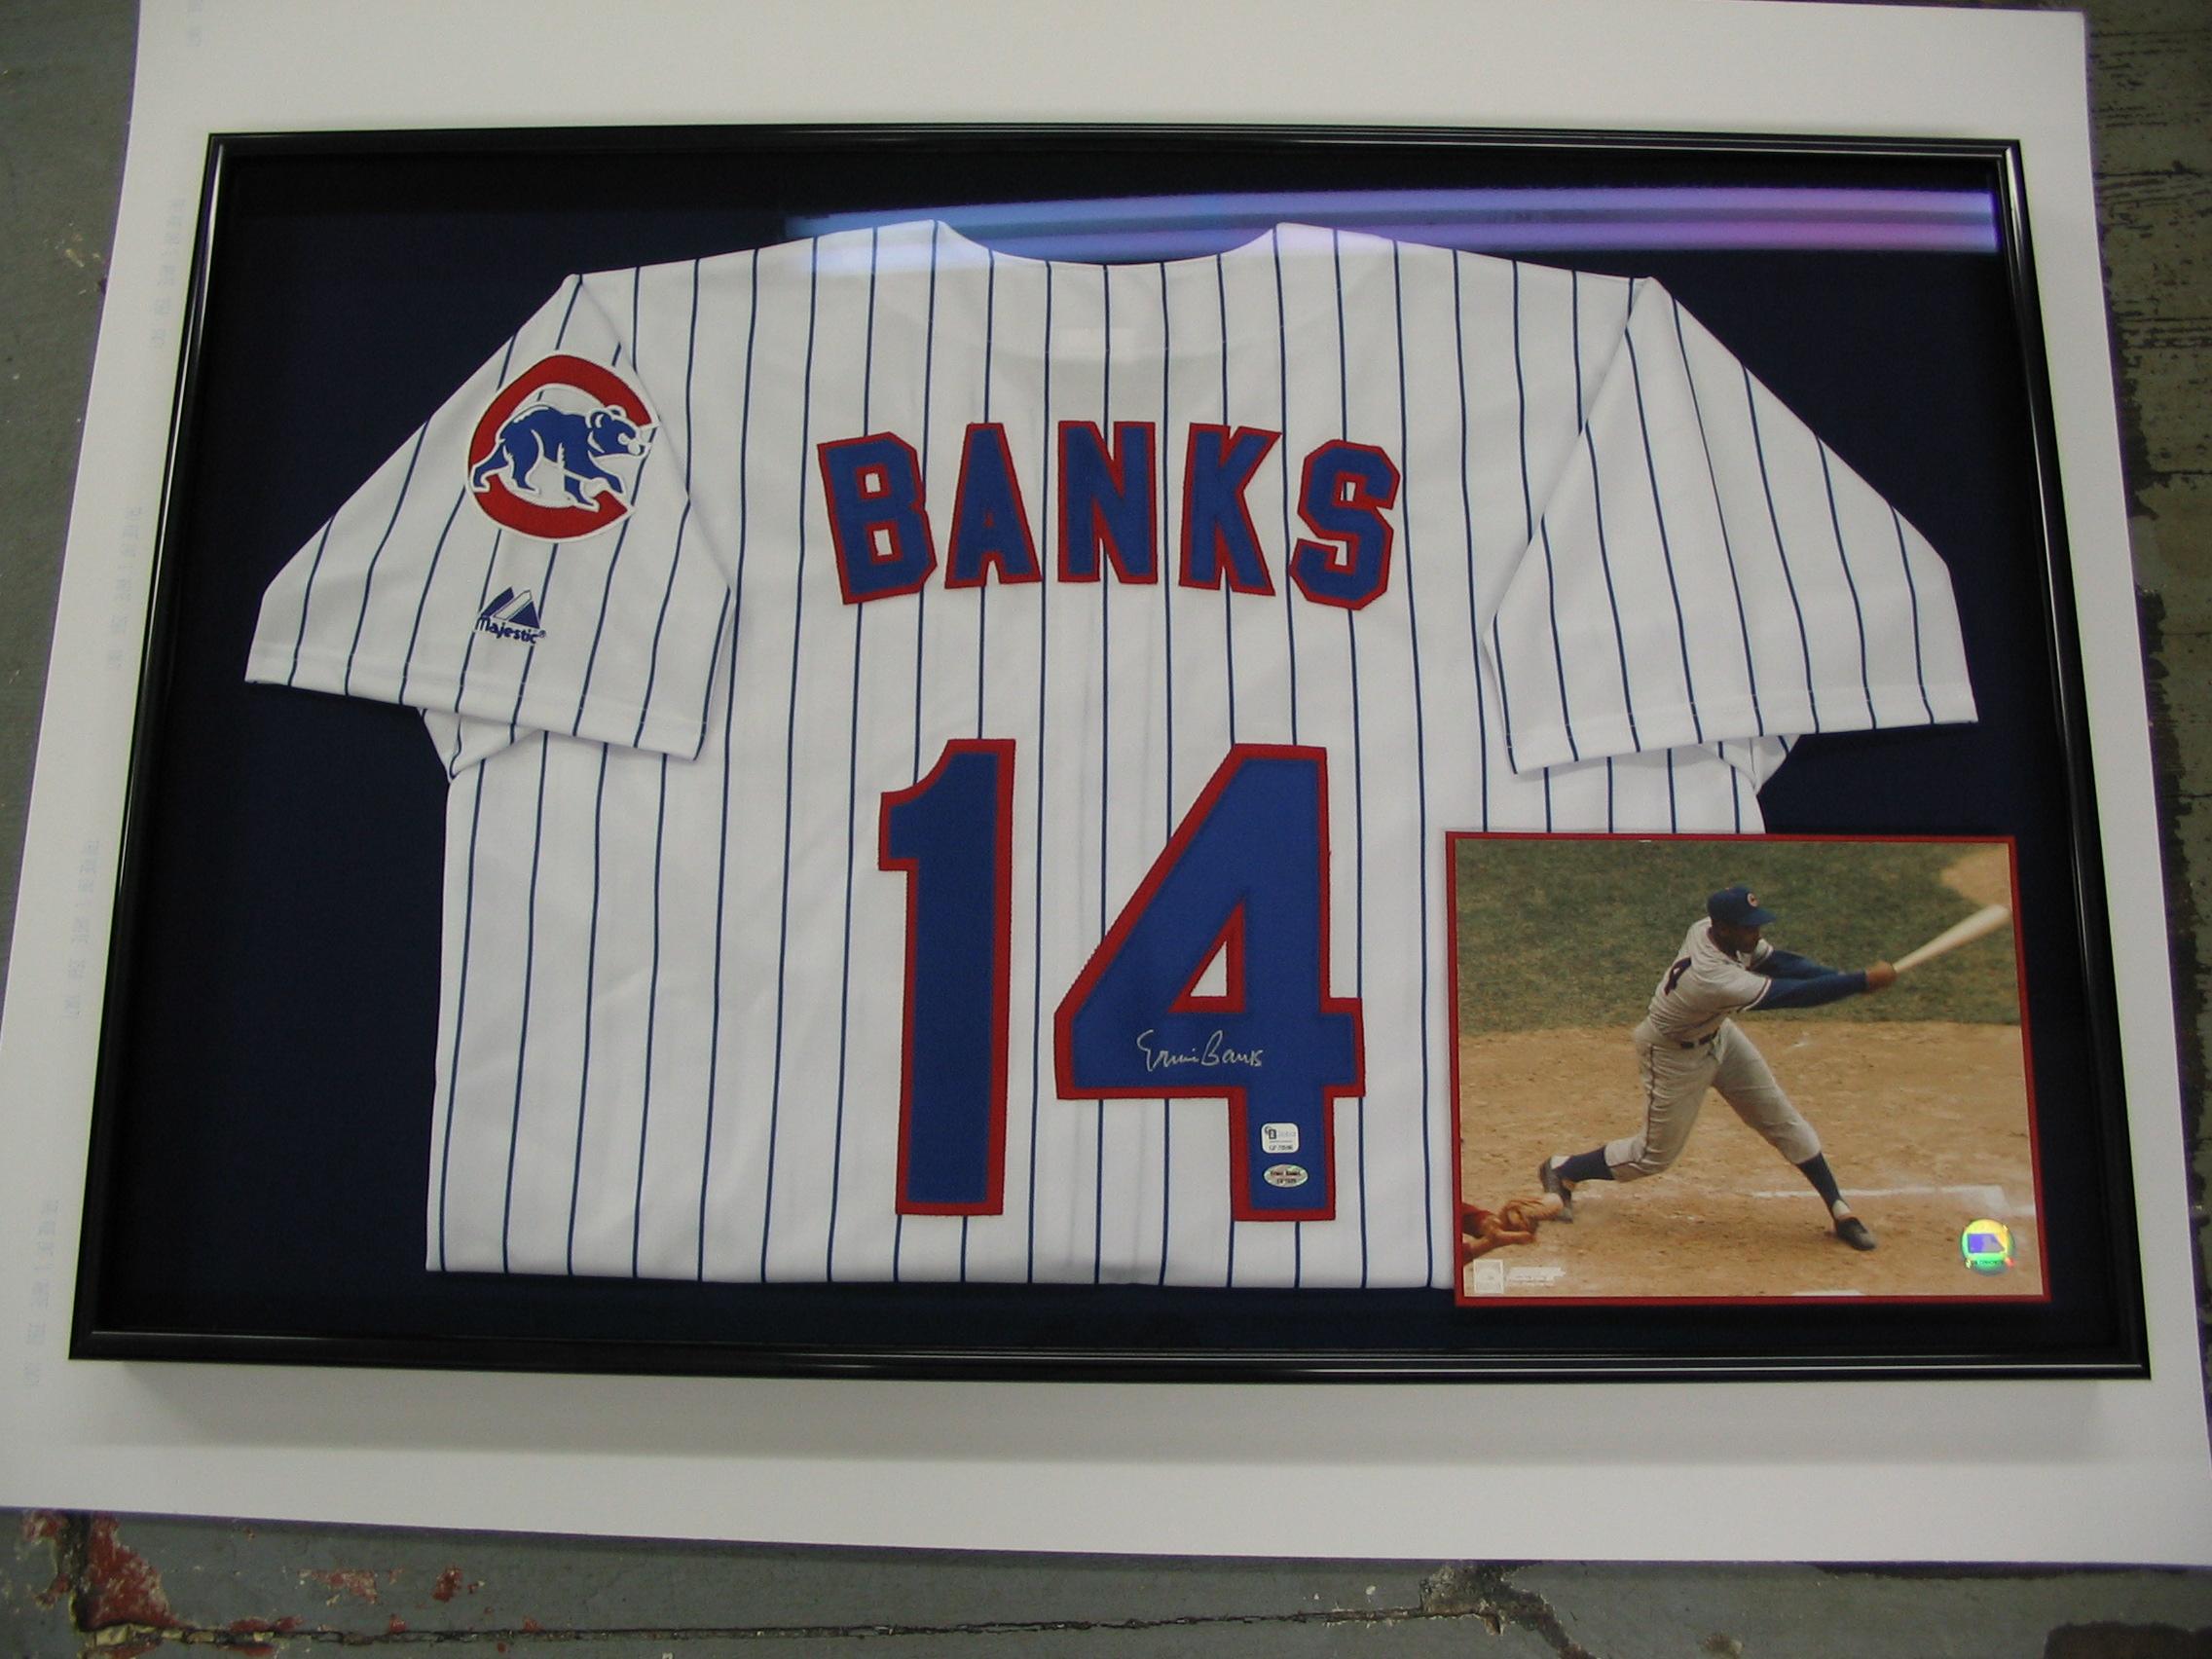 Chicago Cubs Ernie Banks framed by The Framemakers